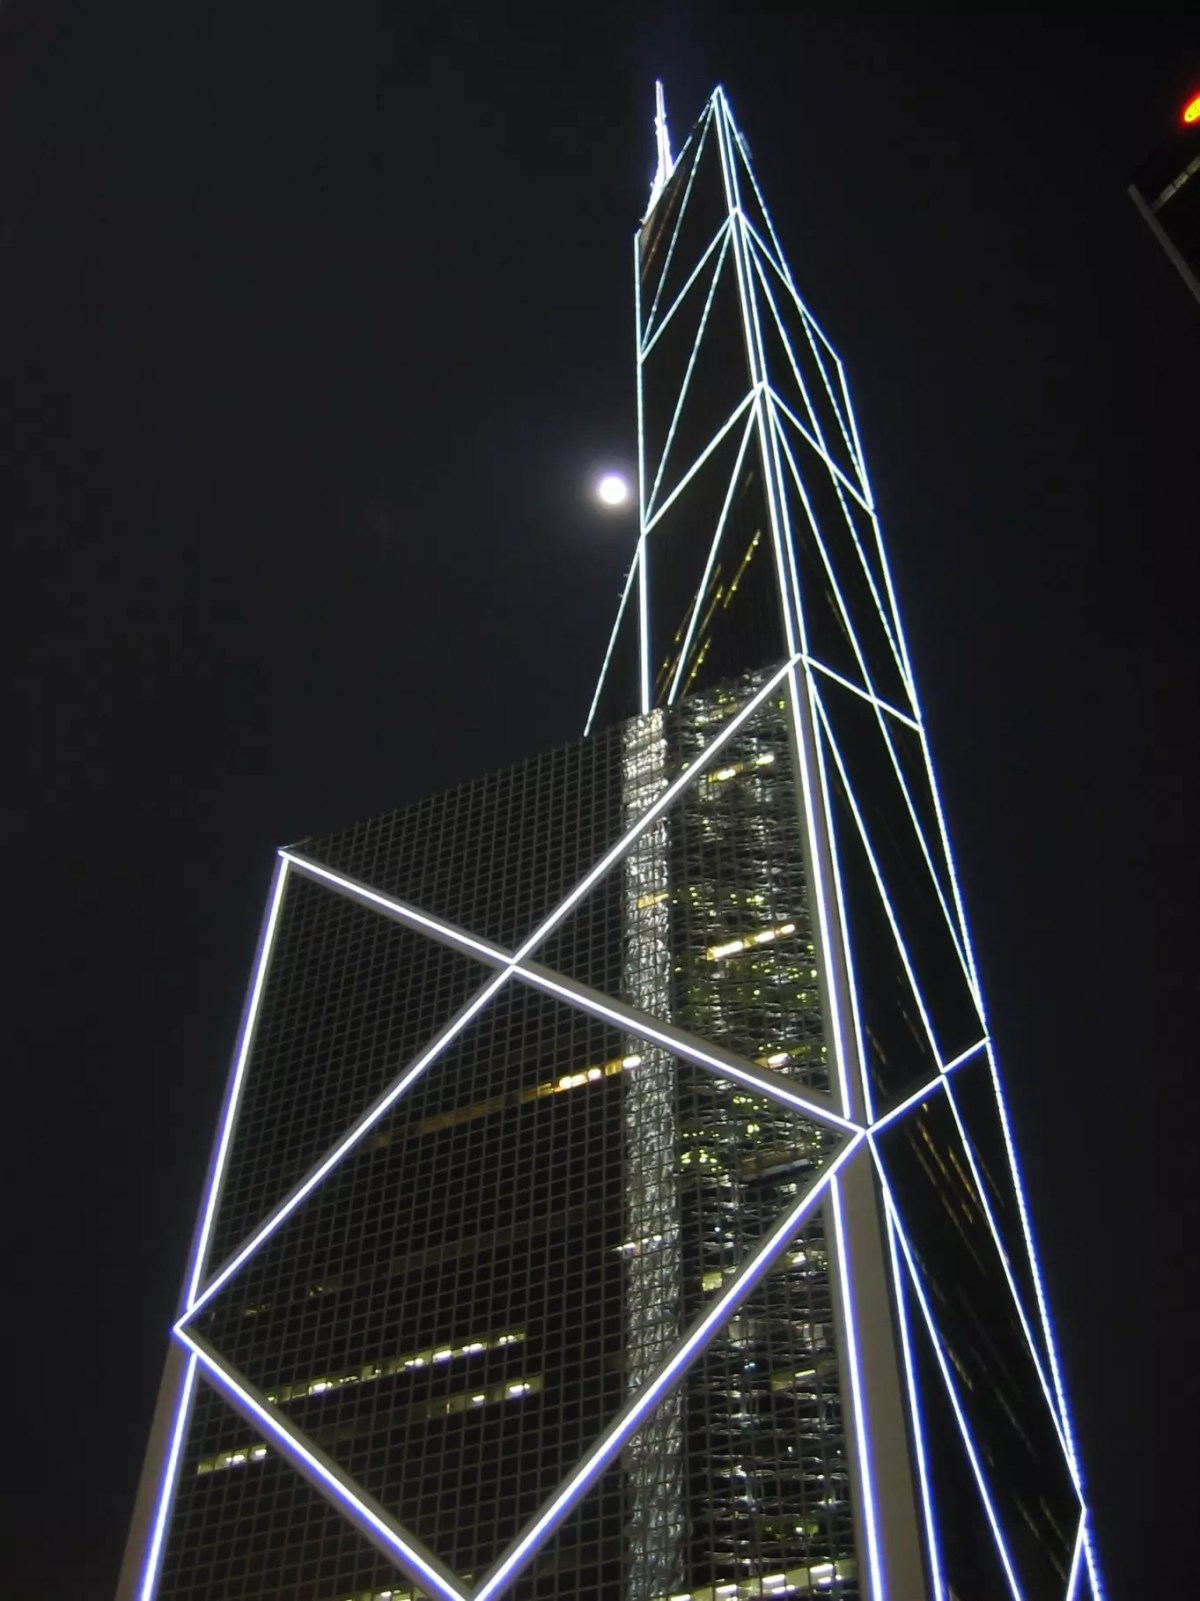 L'immeuble de la Bank of China à Hong Kong - Photo libre de droits